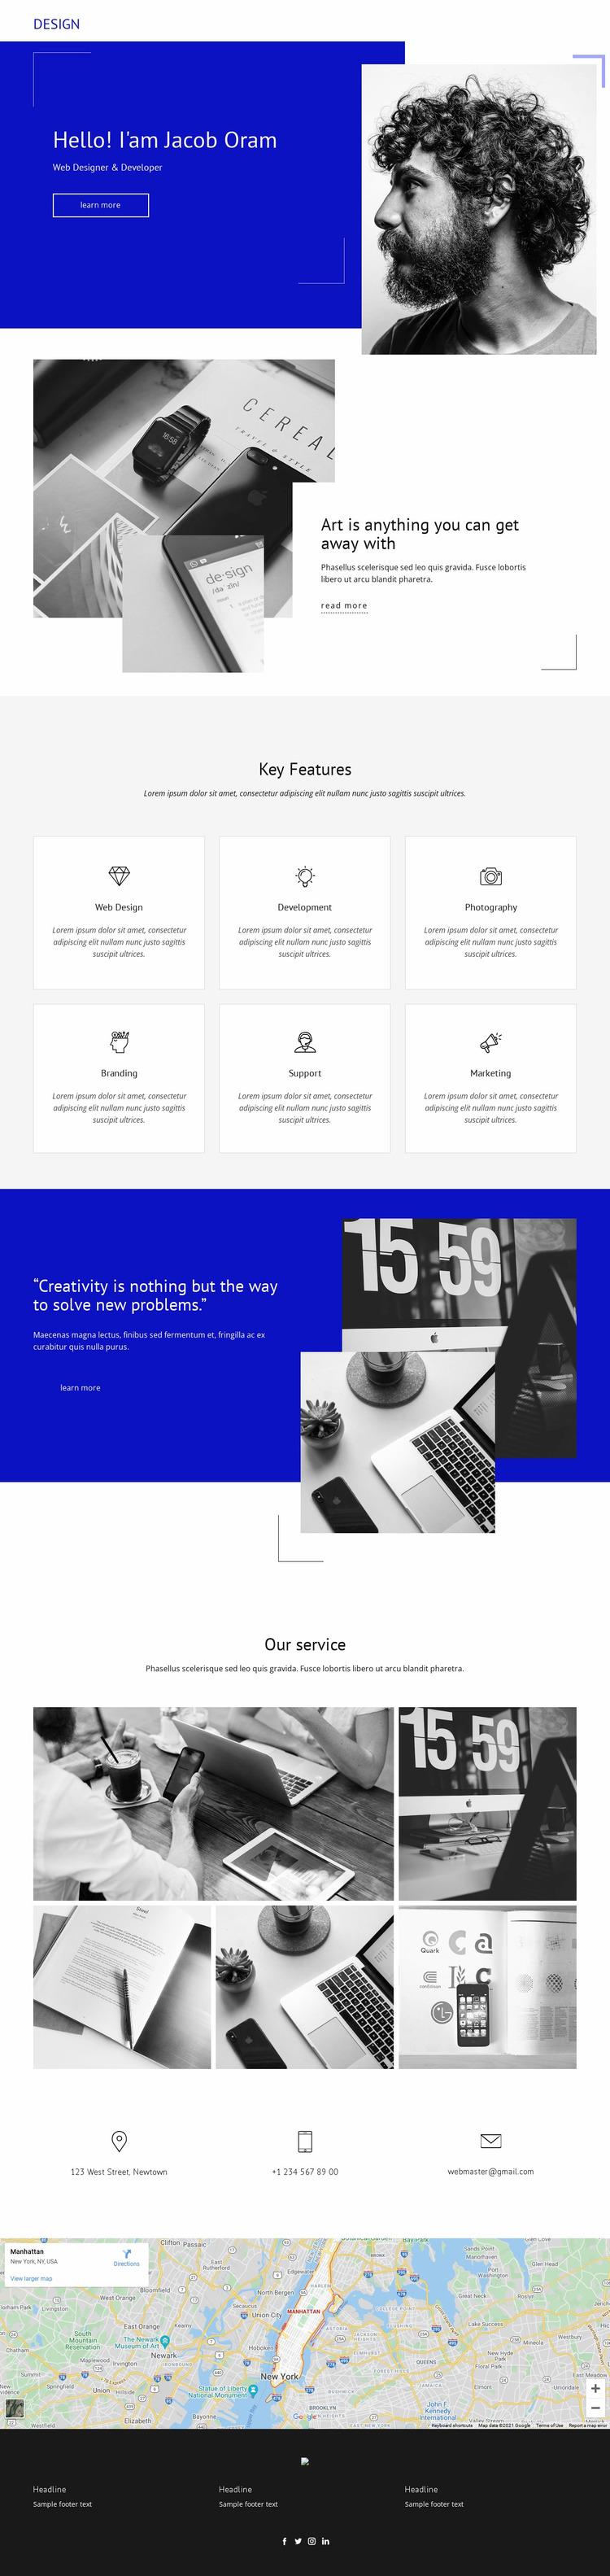 Jacob Oram Portfolio Website Mockup